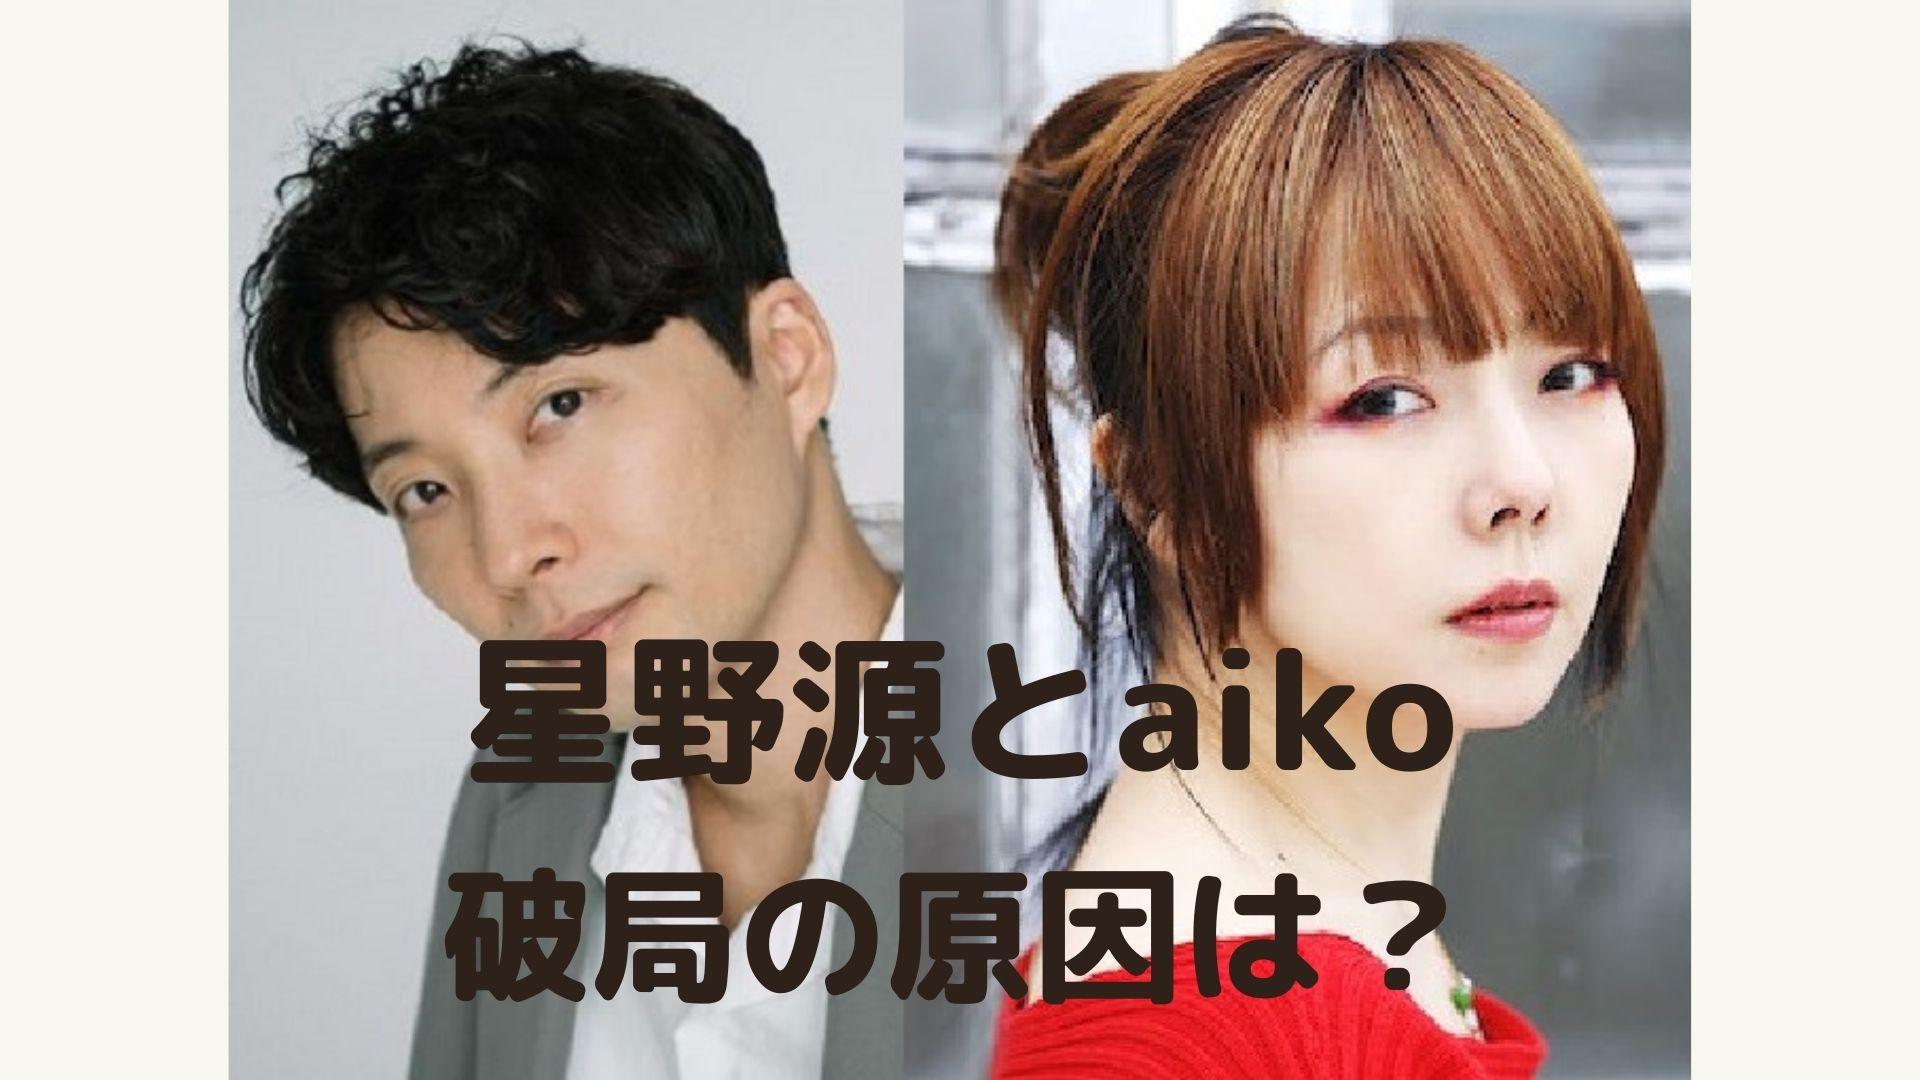 gen-hoshino-aiko-dating-period